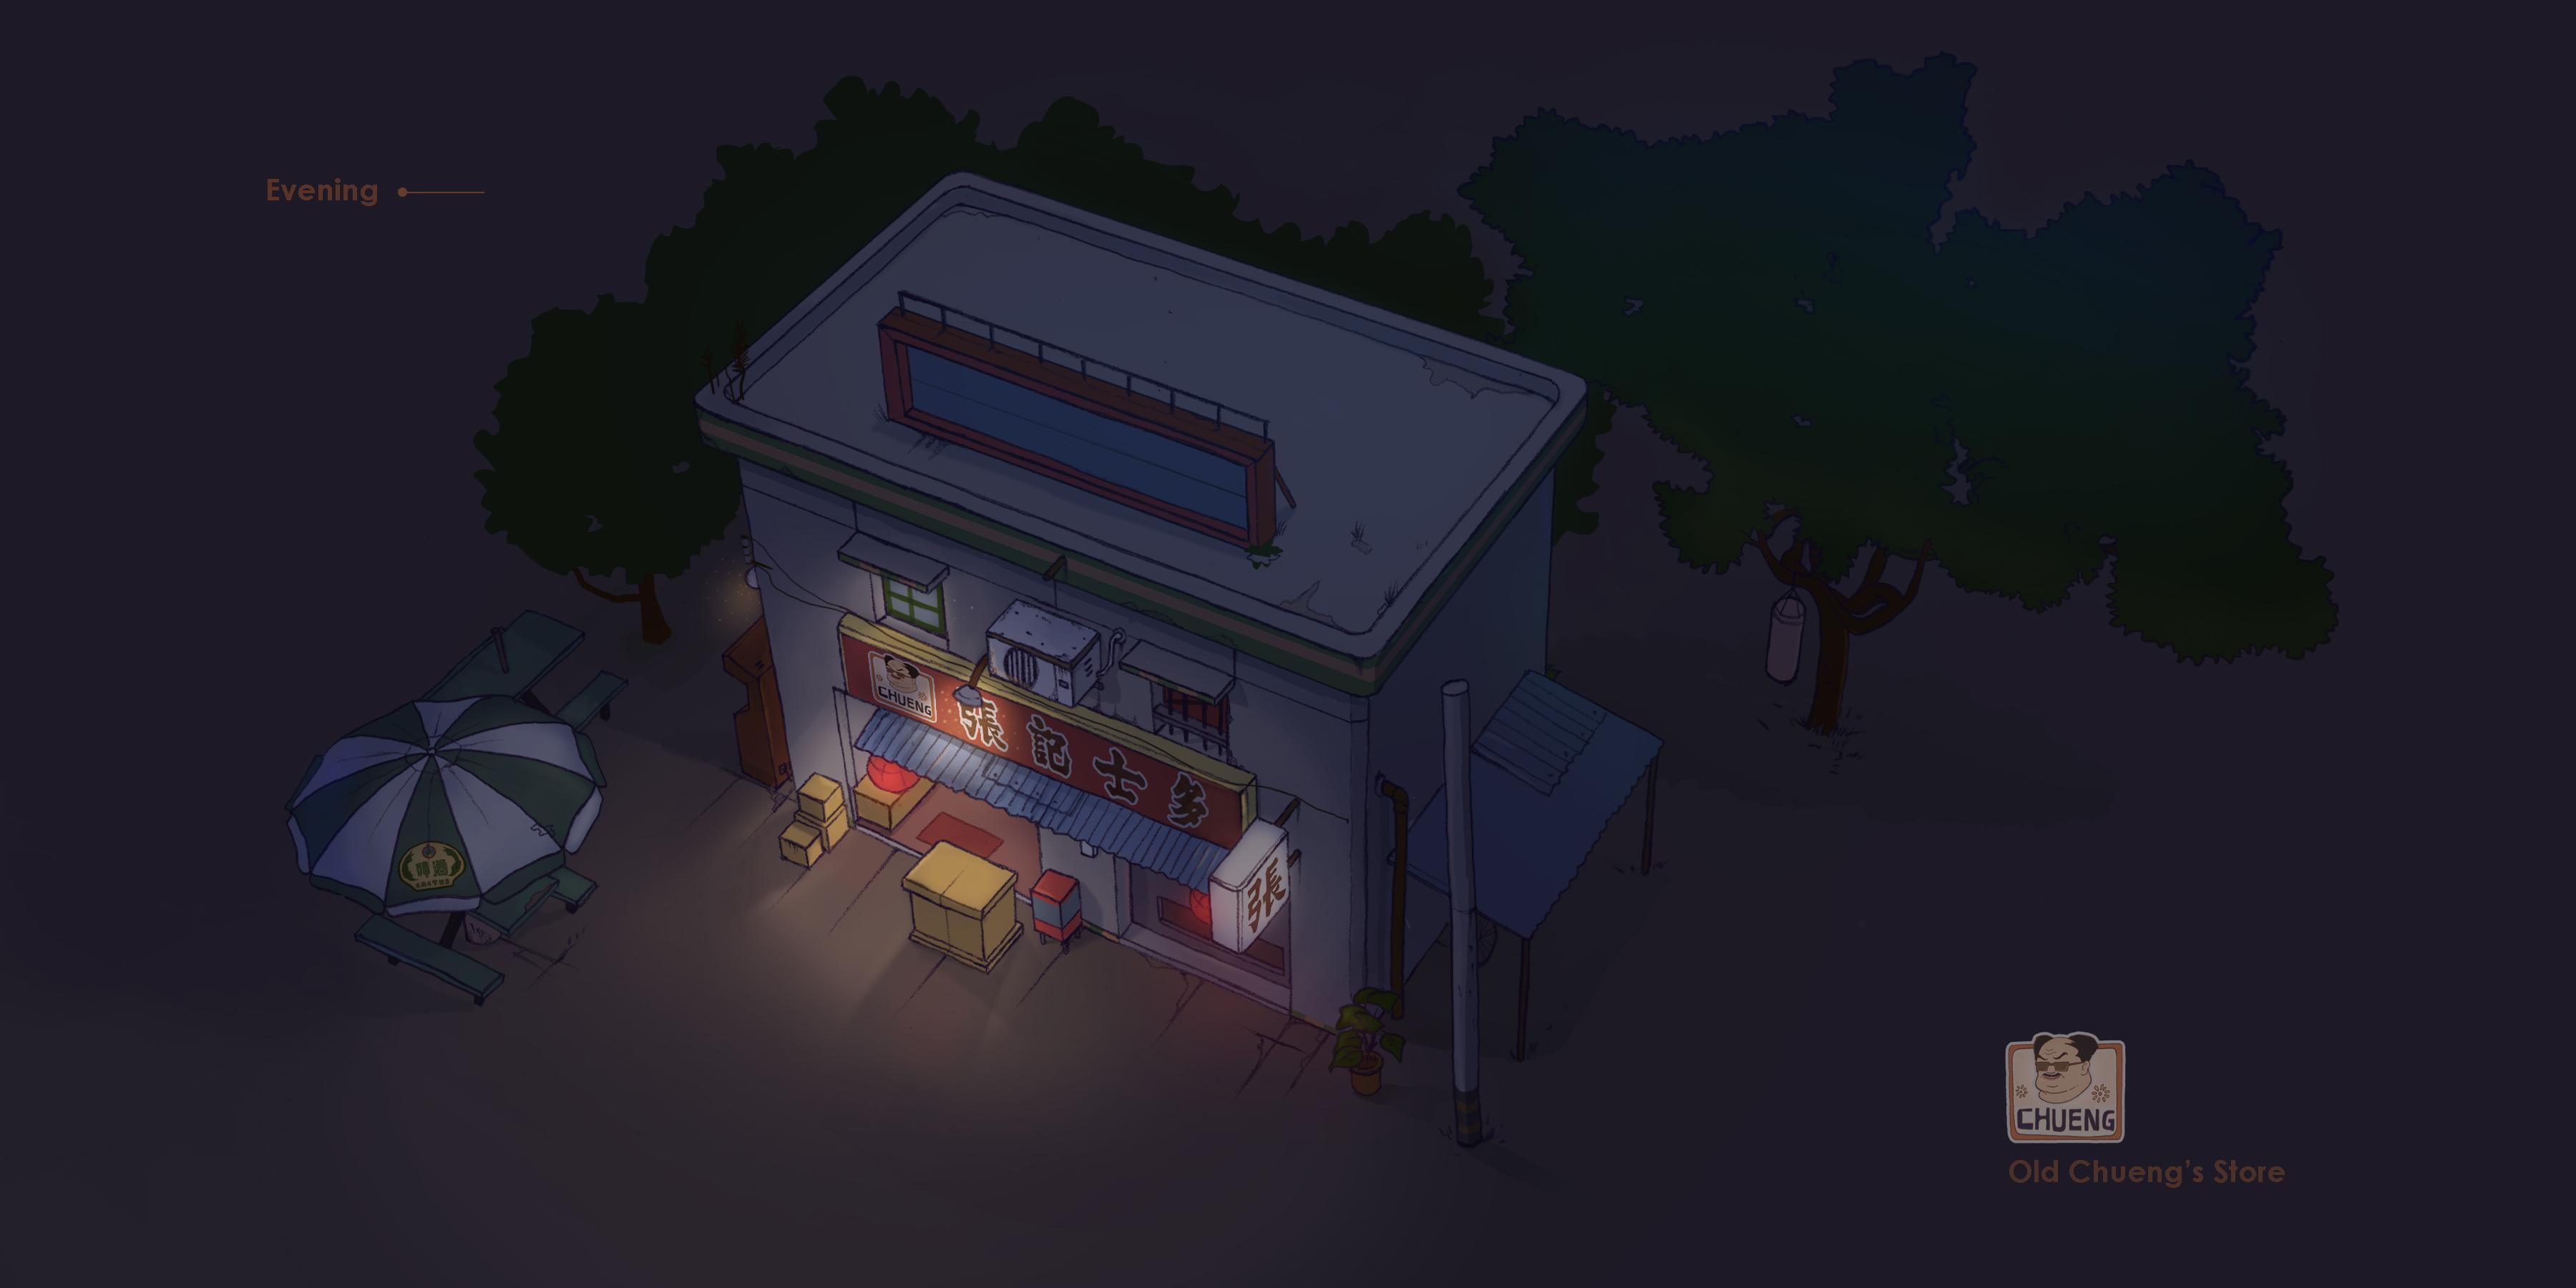 store-presentation-evening